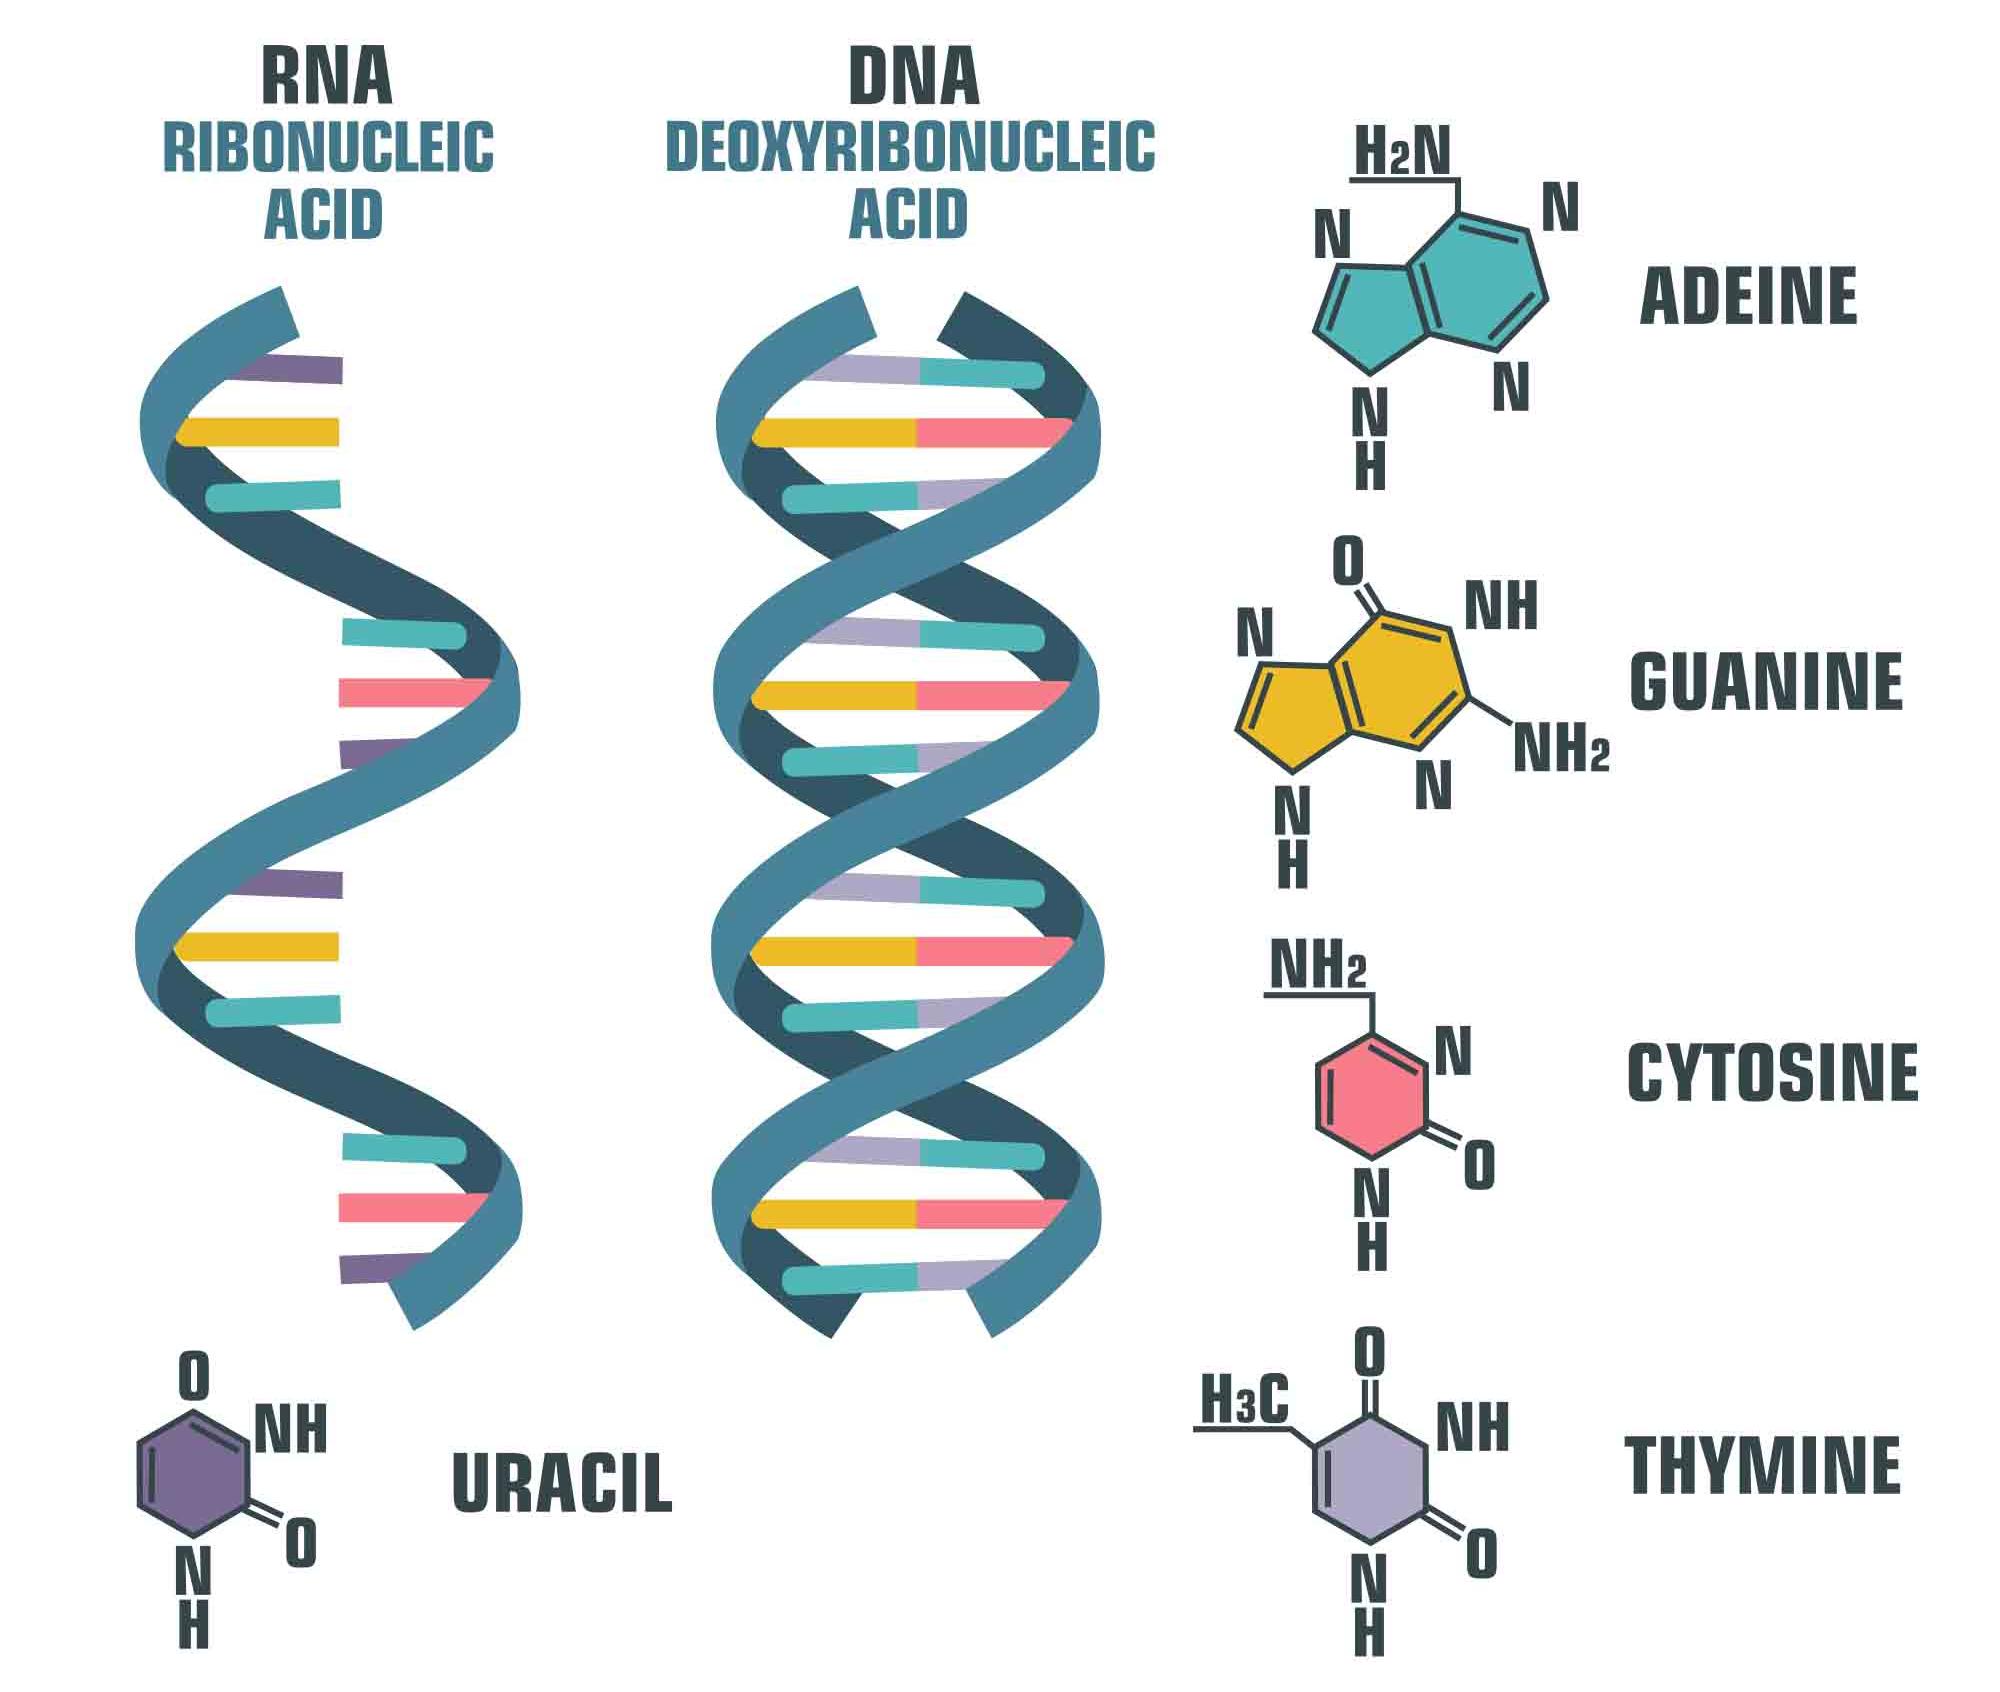 DNA vs. RNA   Image: ShadeDesign, Shutterstock